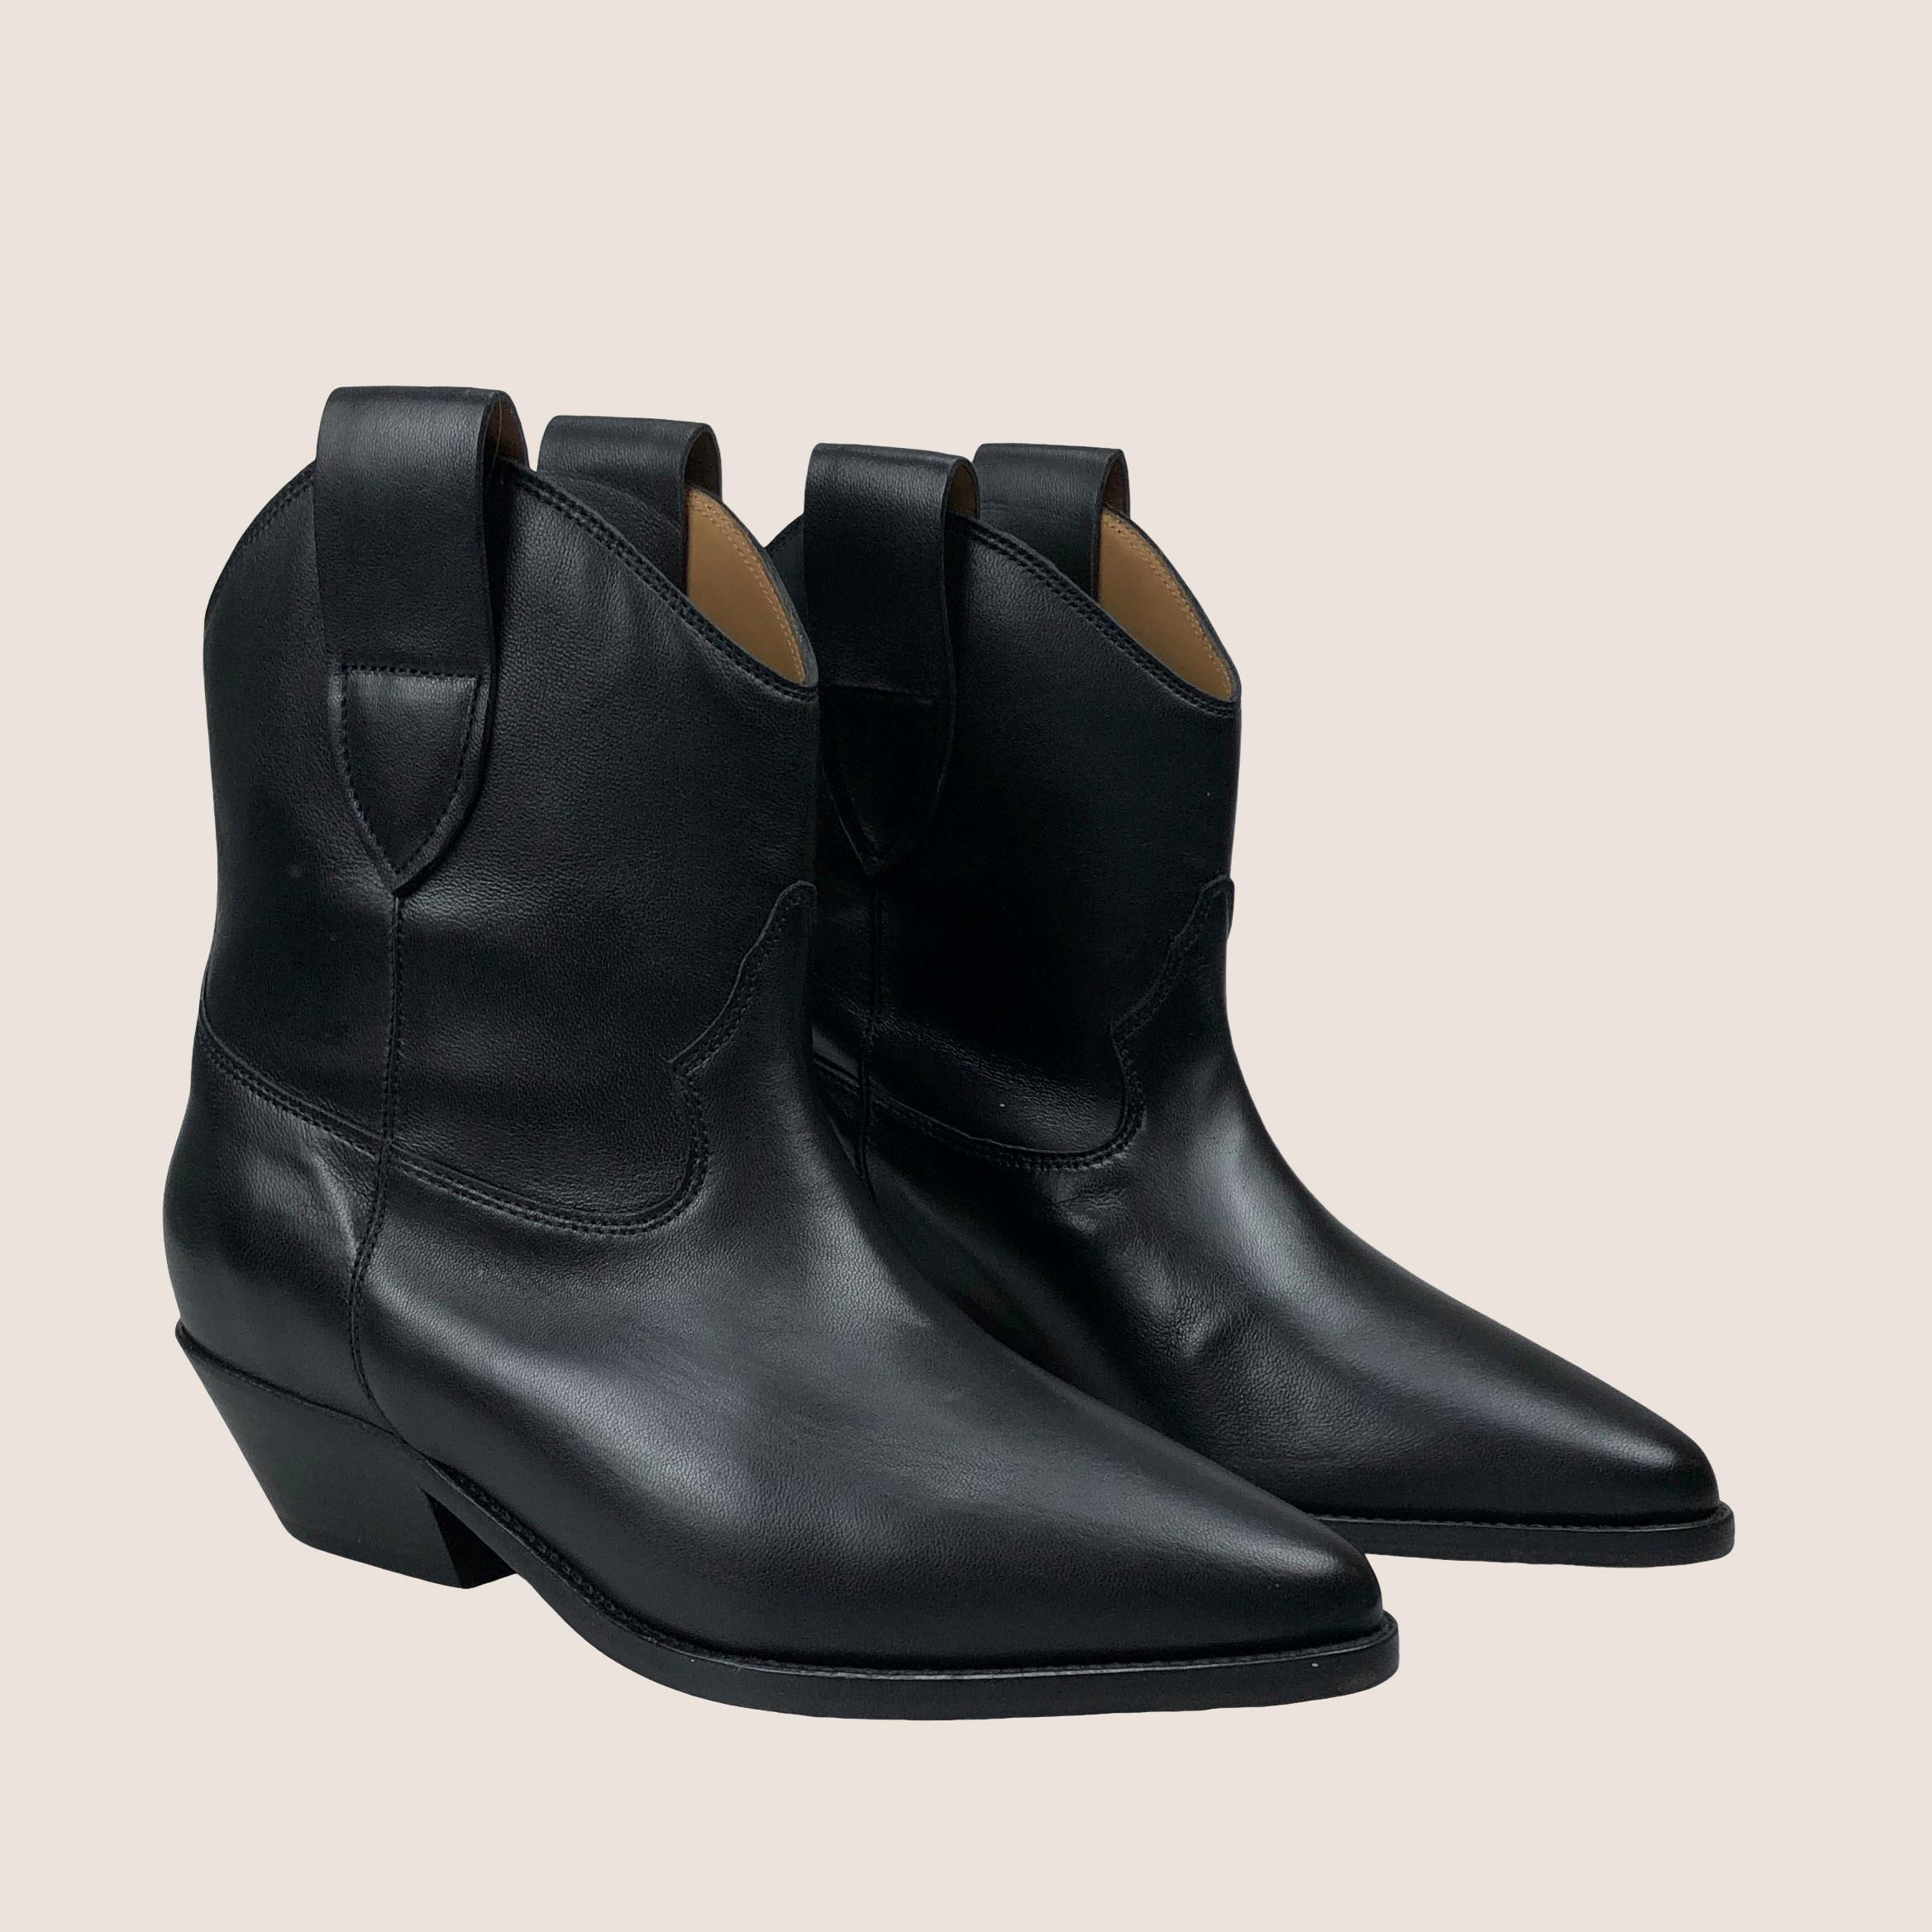 Sabine Cowboy Boots